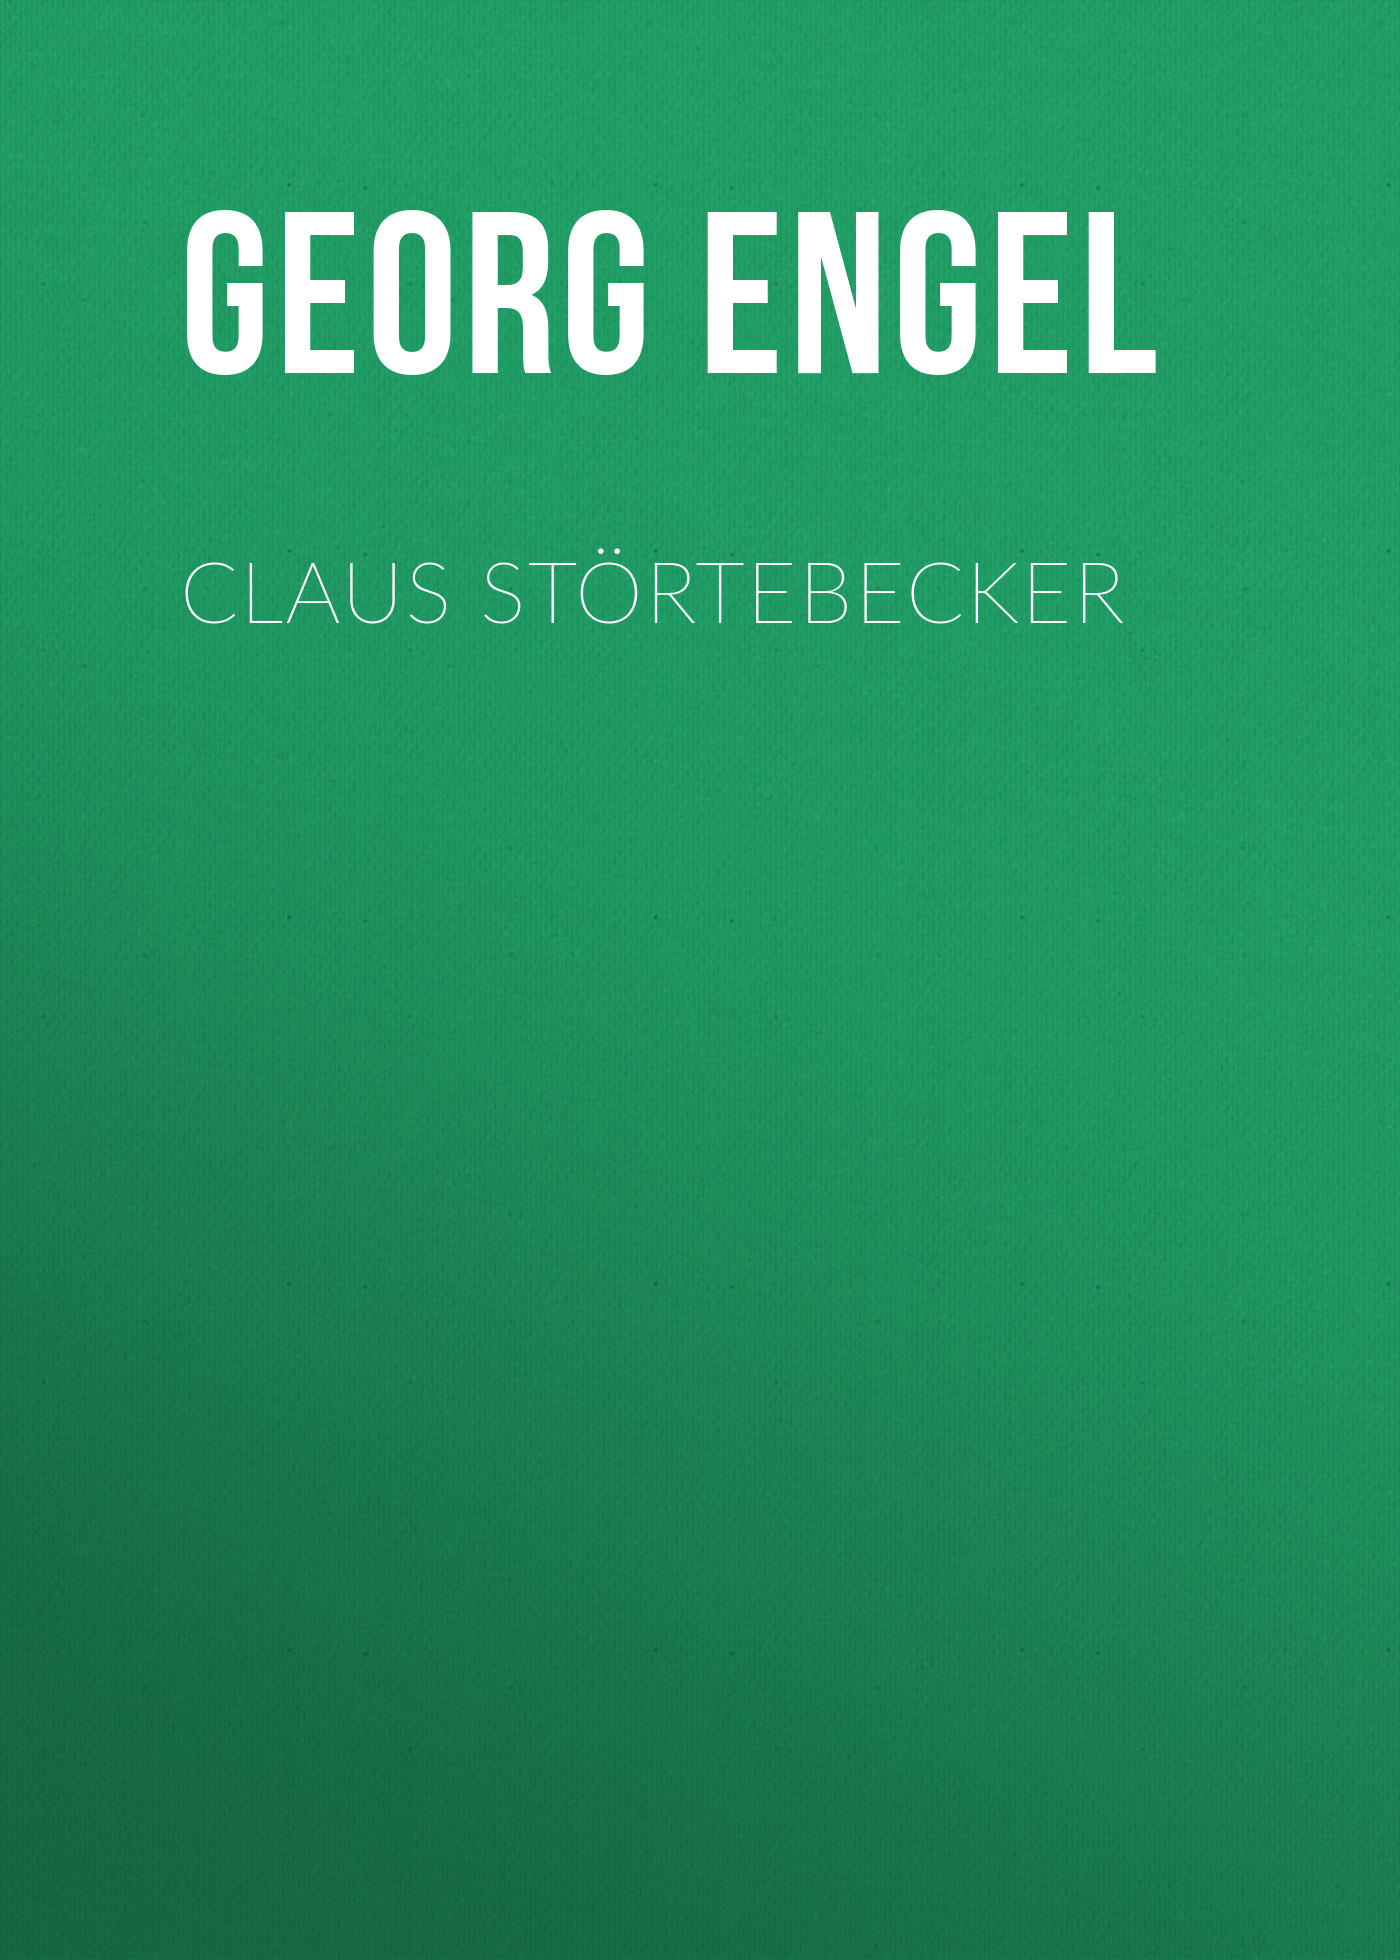 Georg Engel Claus Störtebecker santa claus pattern linen pillow case